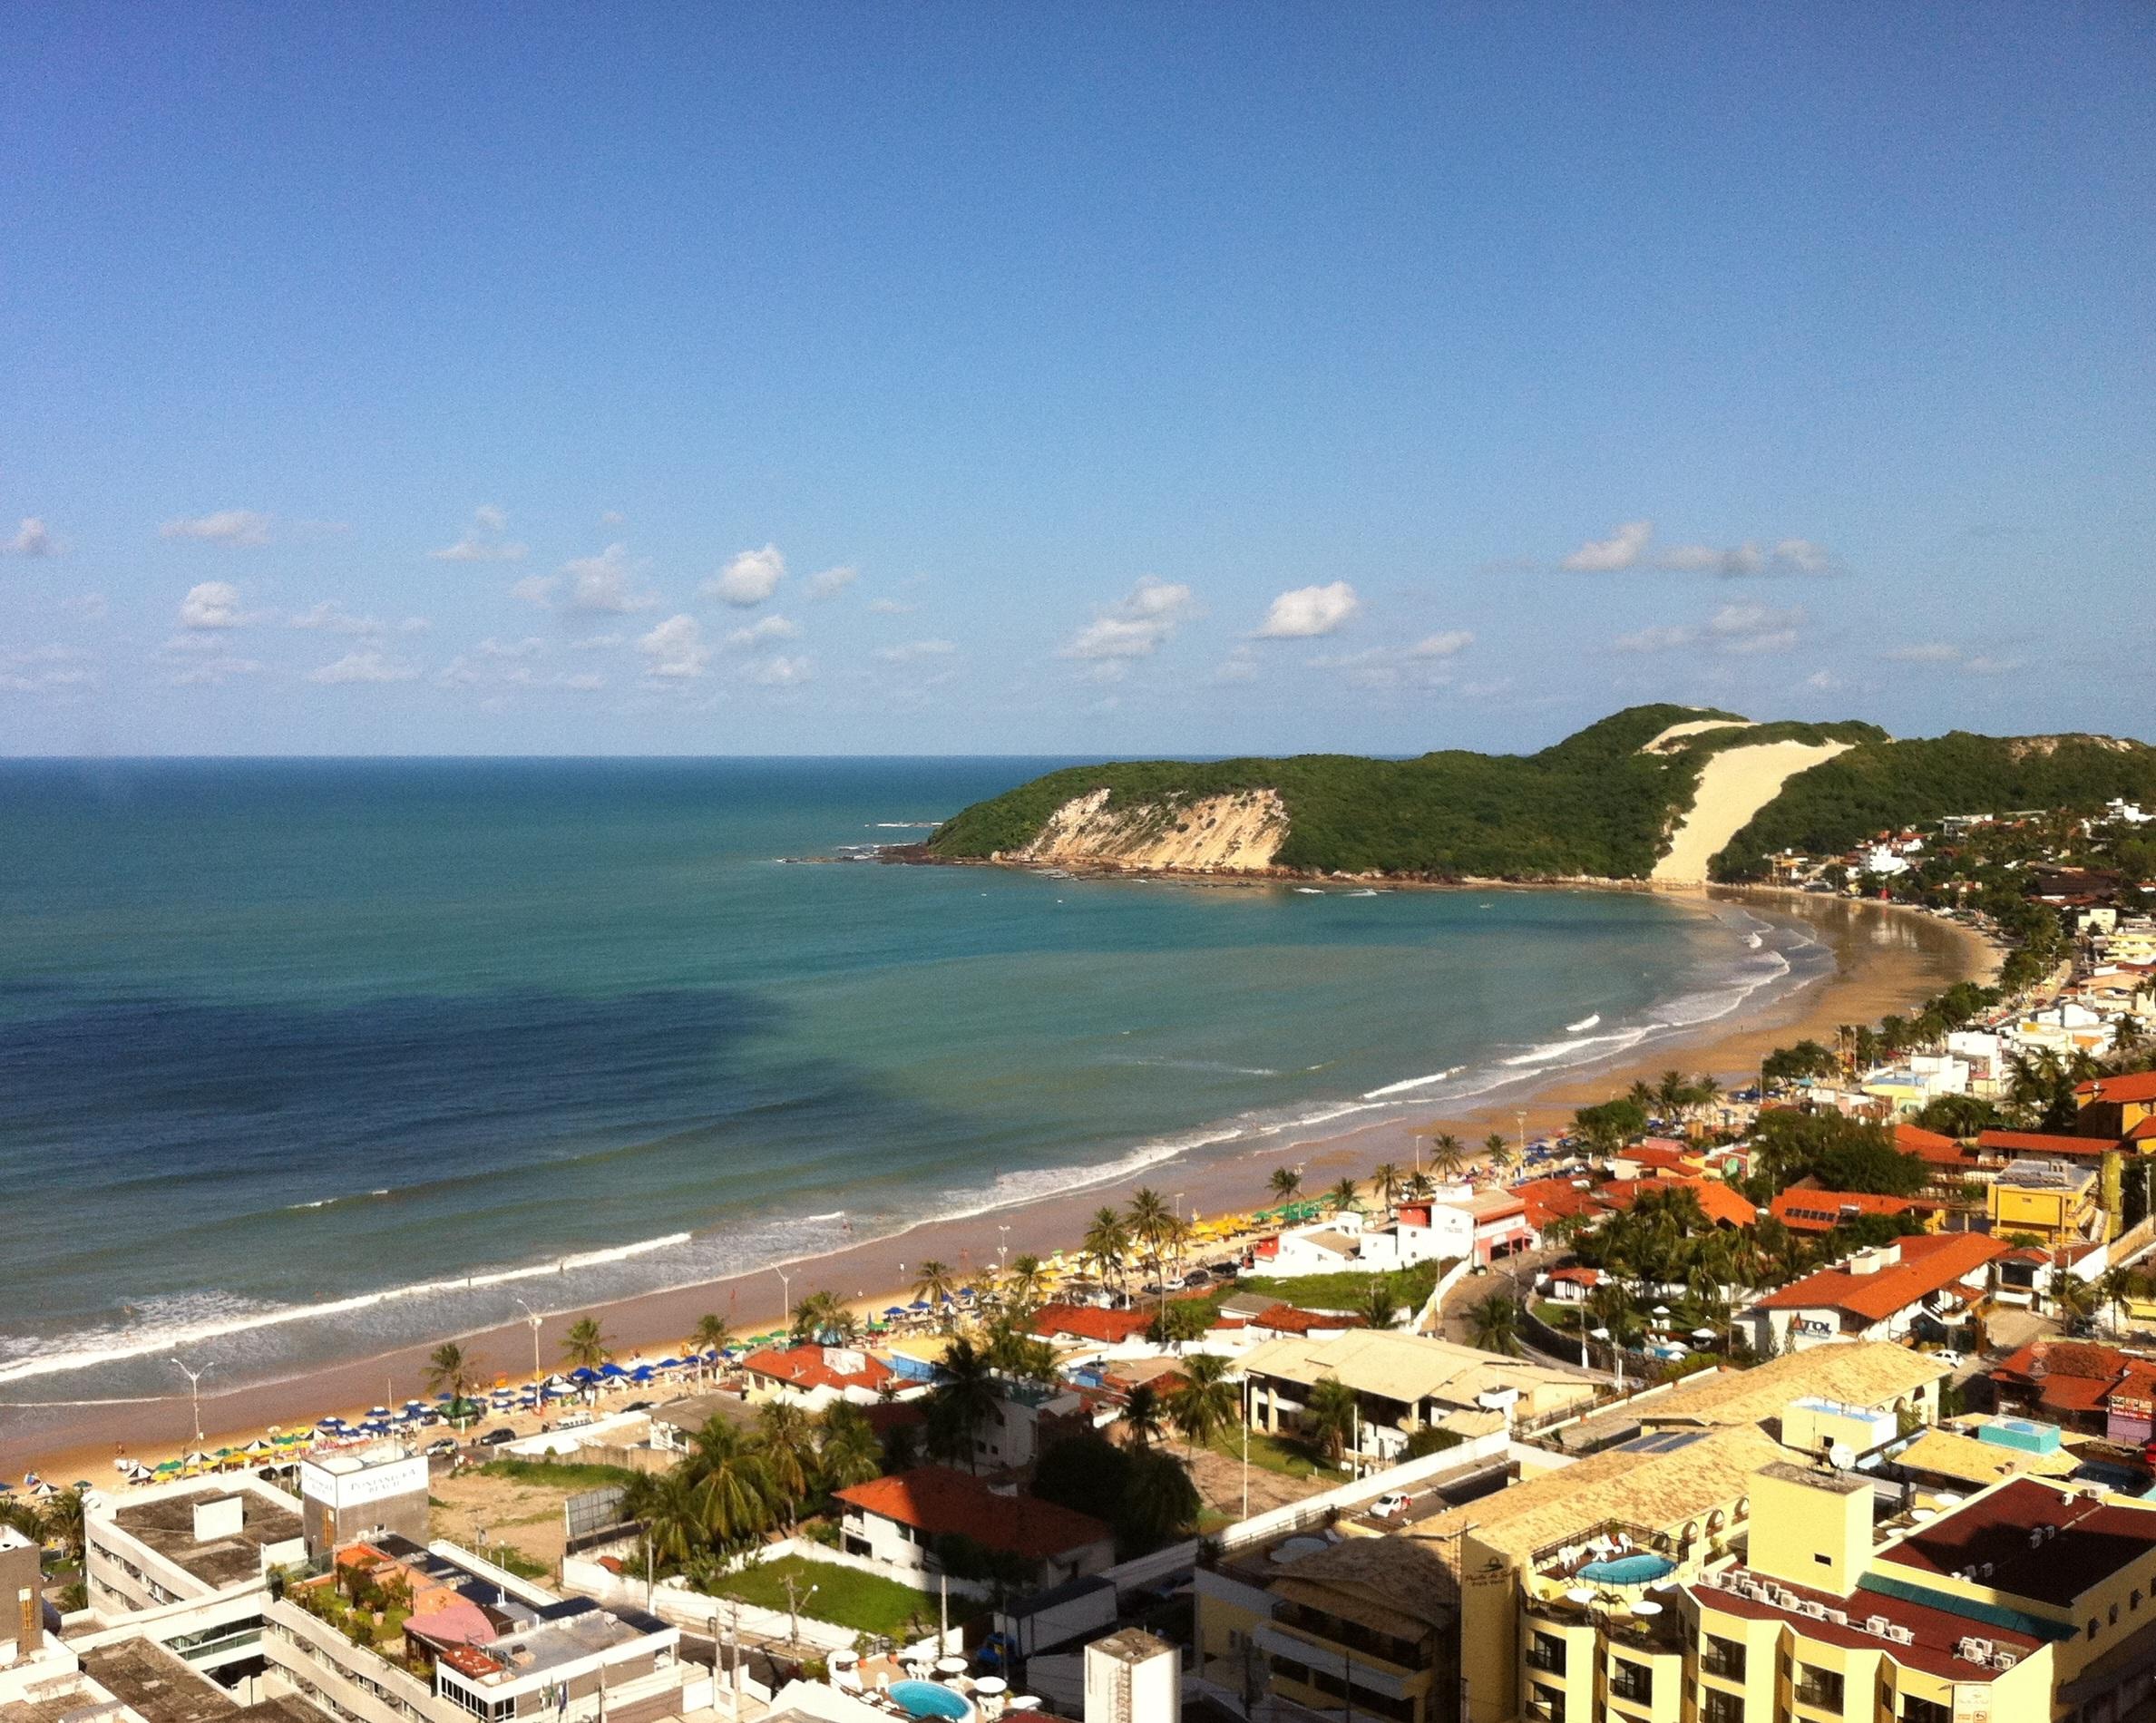 Natal Brazil  city photos gallery : Beaches in Ponta Negra, Natal, Brazil – Travel Around The World ...